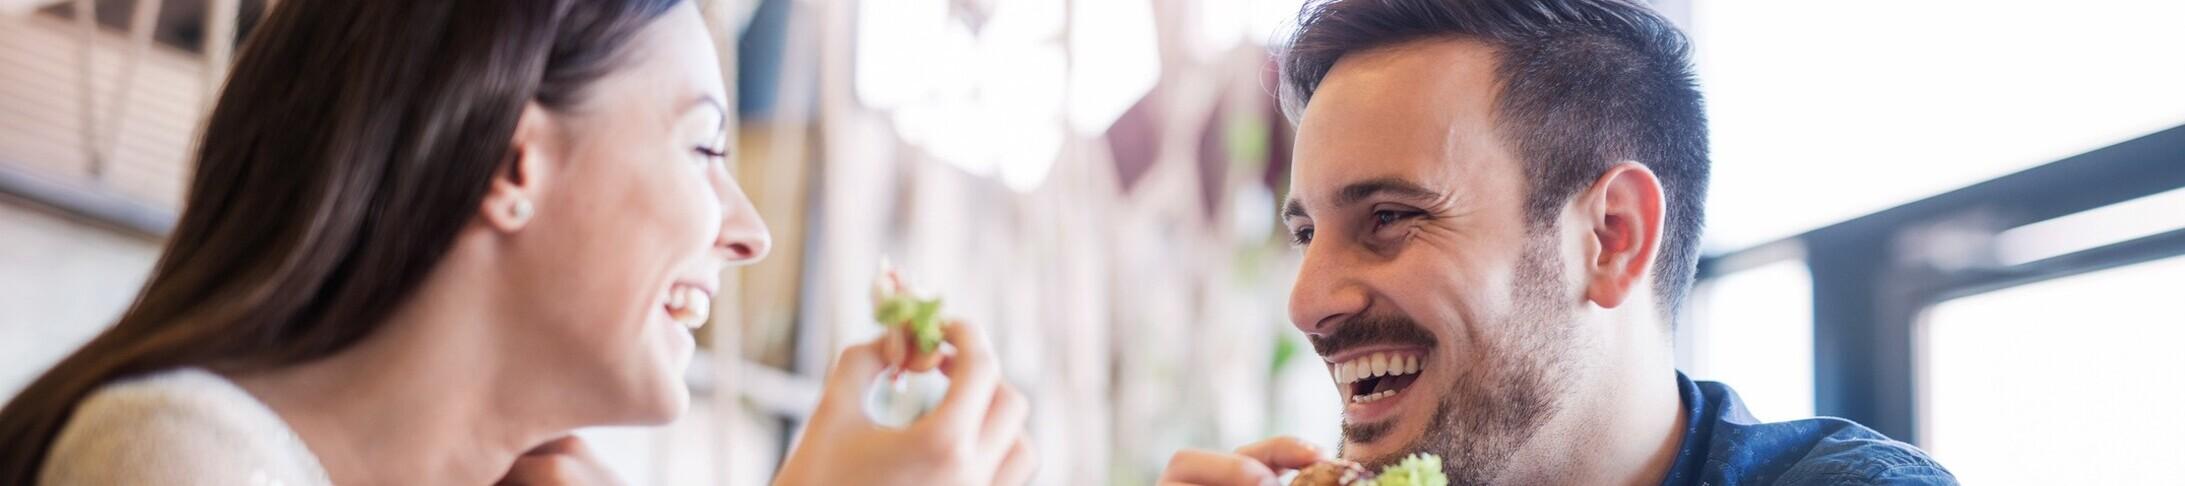 restaurantes saudáveis